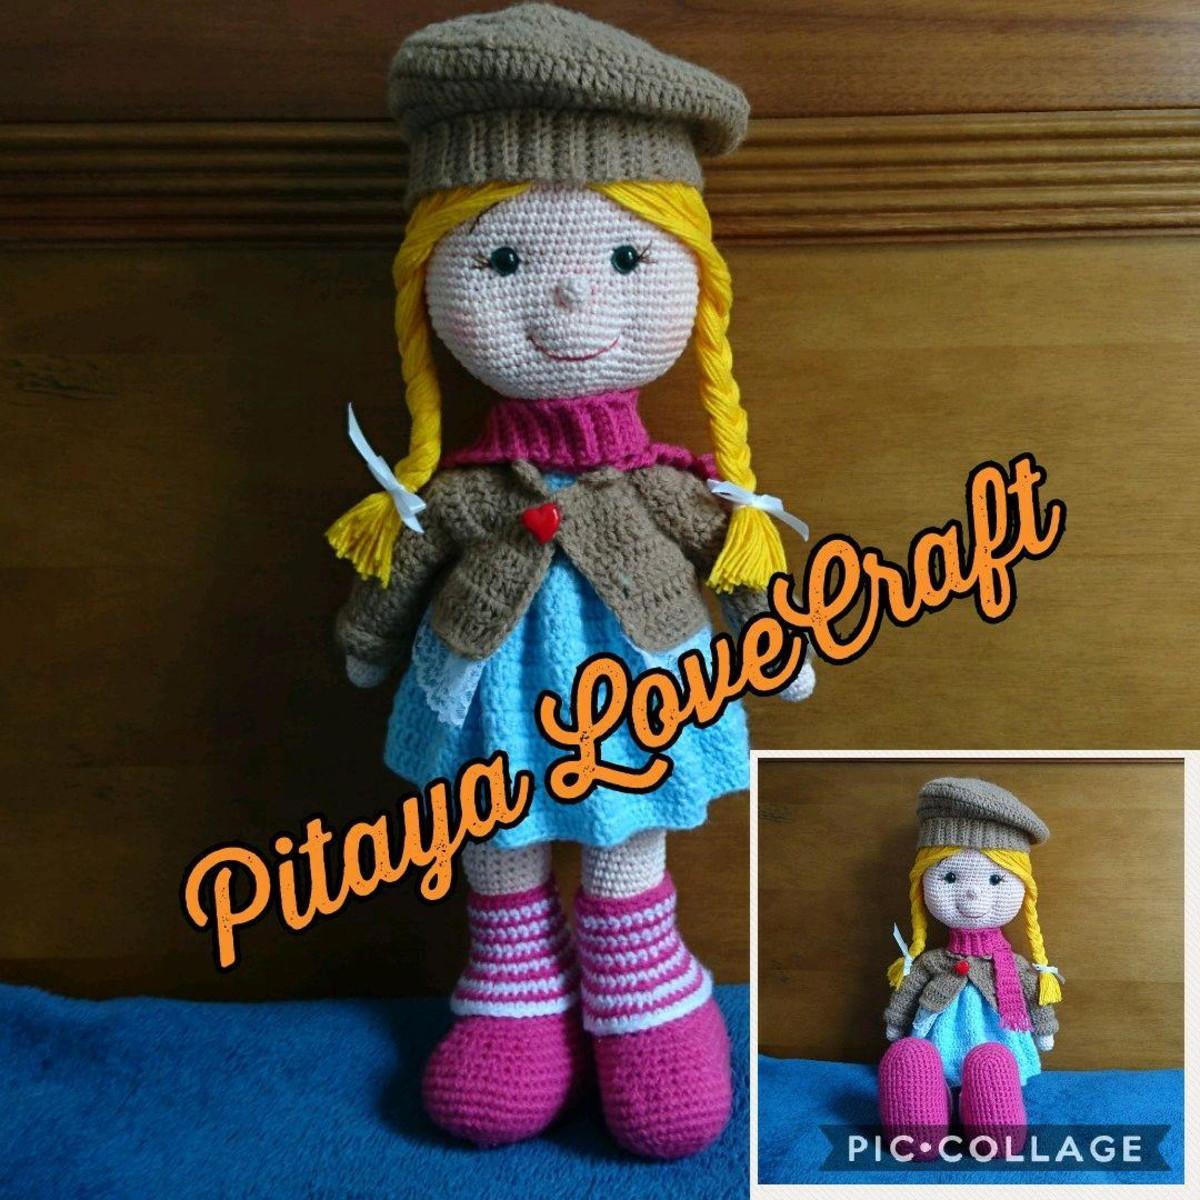 Tonton Doll, Amigurumi Samyeli Bebek | Crafting | Crochet stitches ... | 1200x1200